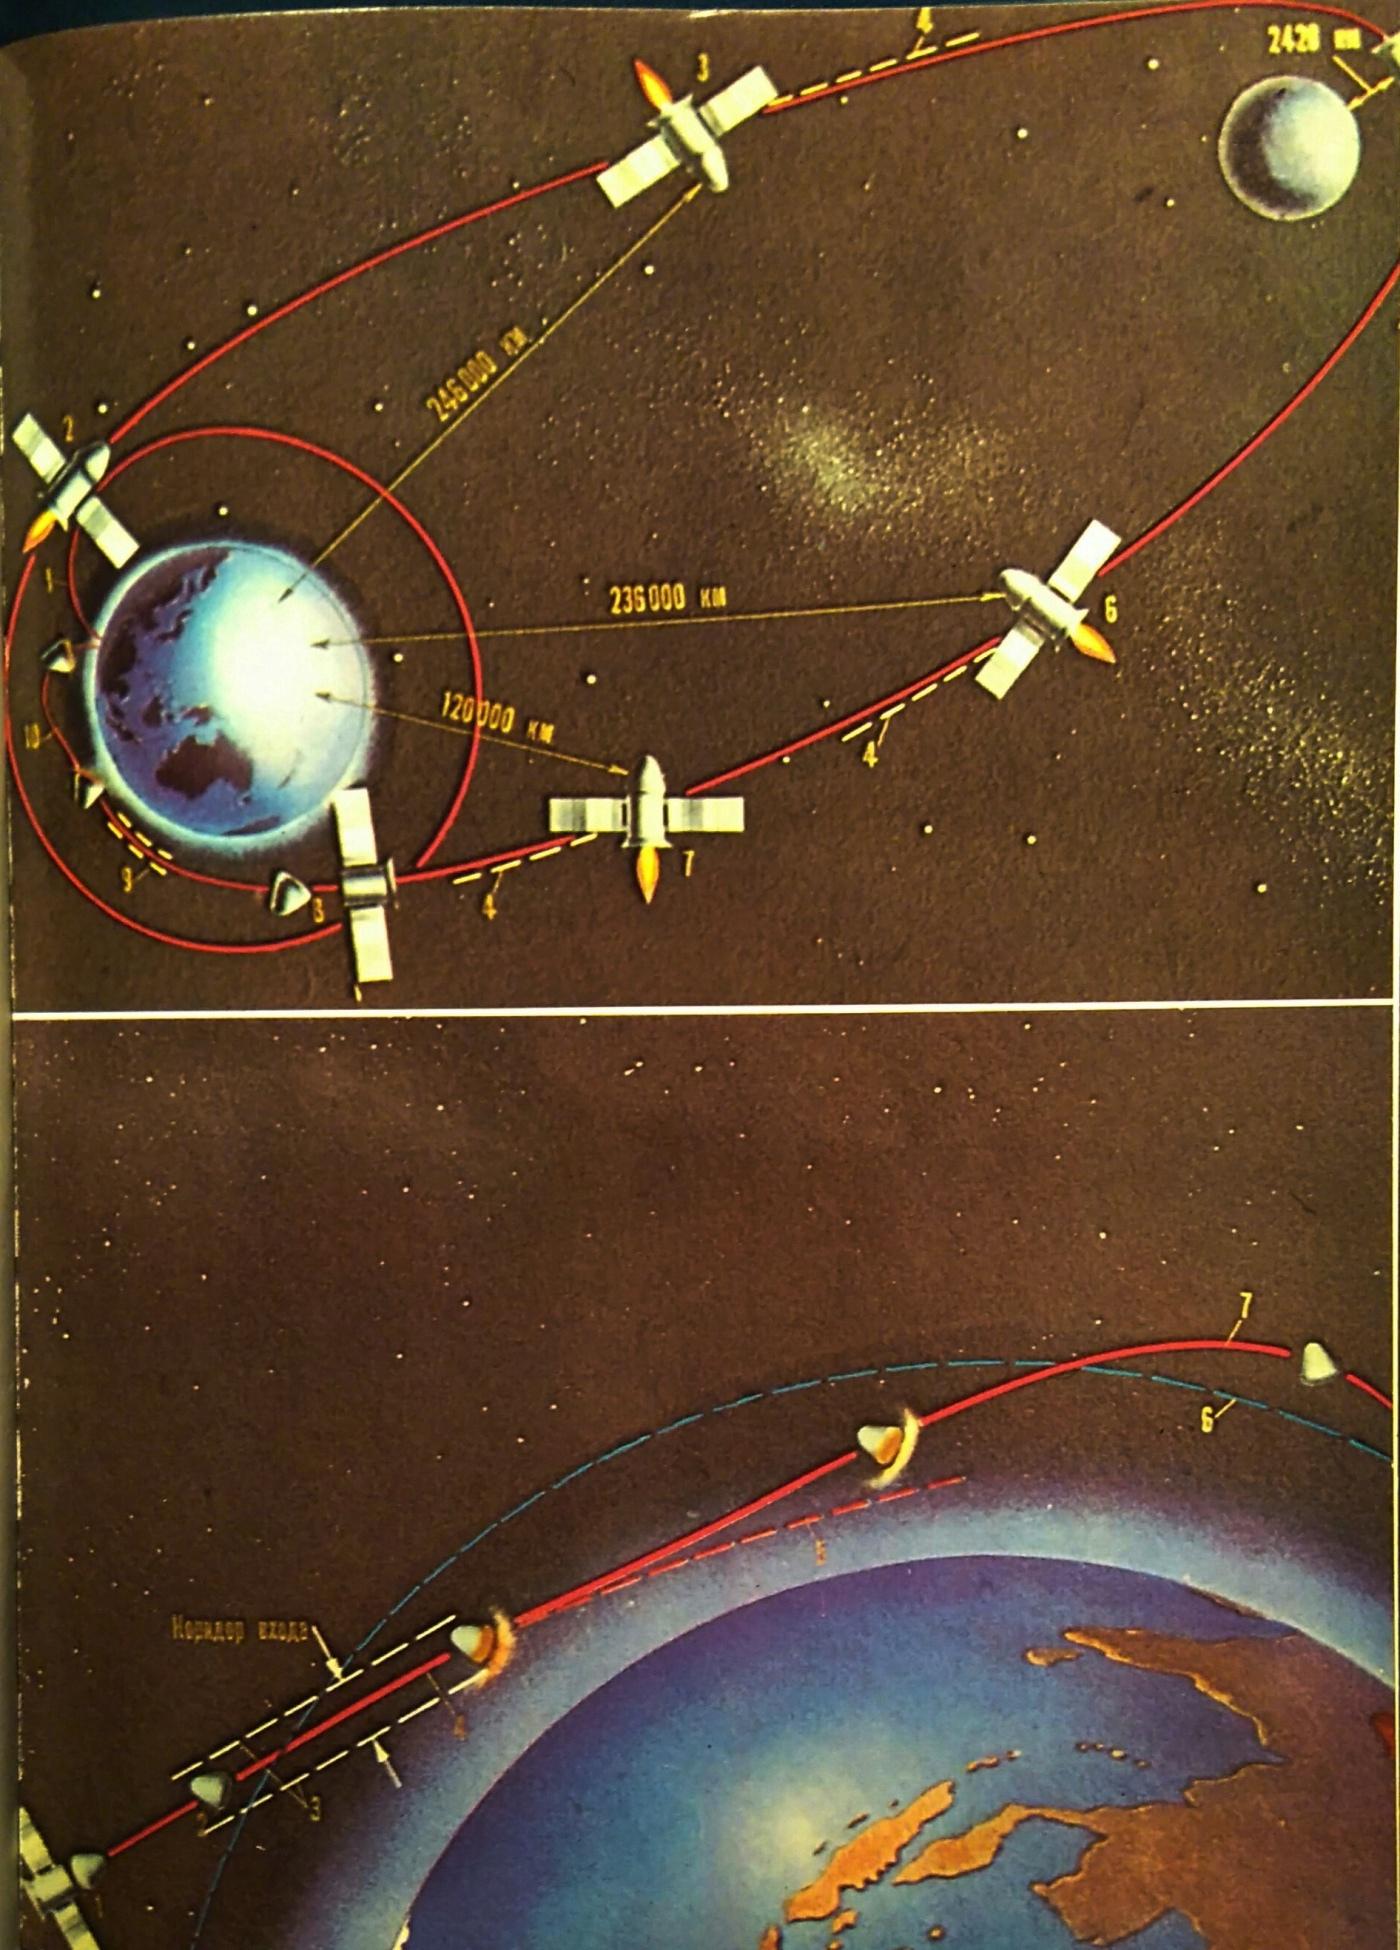 5fc1dea4c1bf2_Zond_trajectoire-rentre_1968.JPG.fc9e6ad1ba2ffd392b9c166e094ca986.JPG